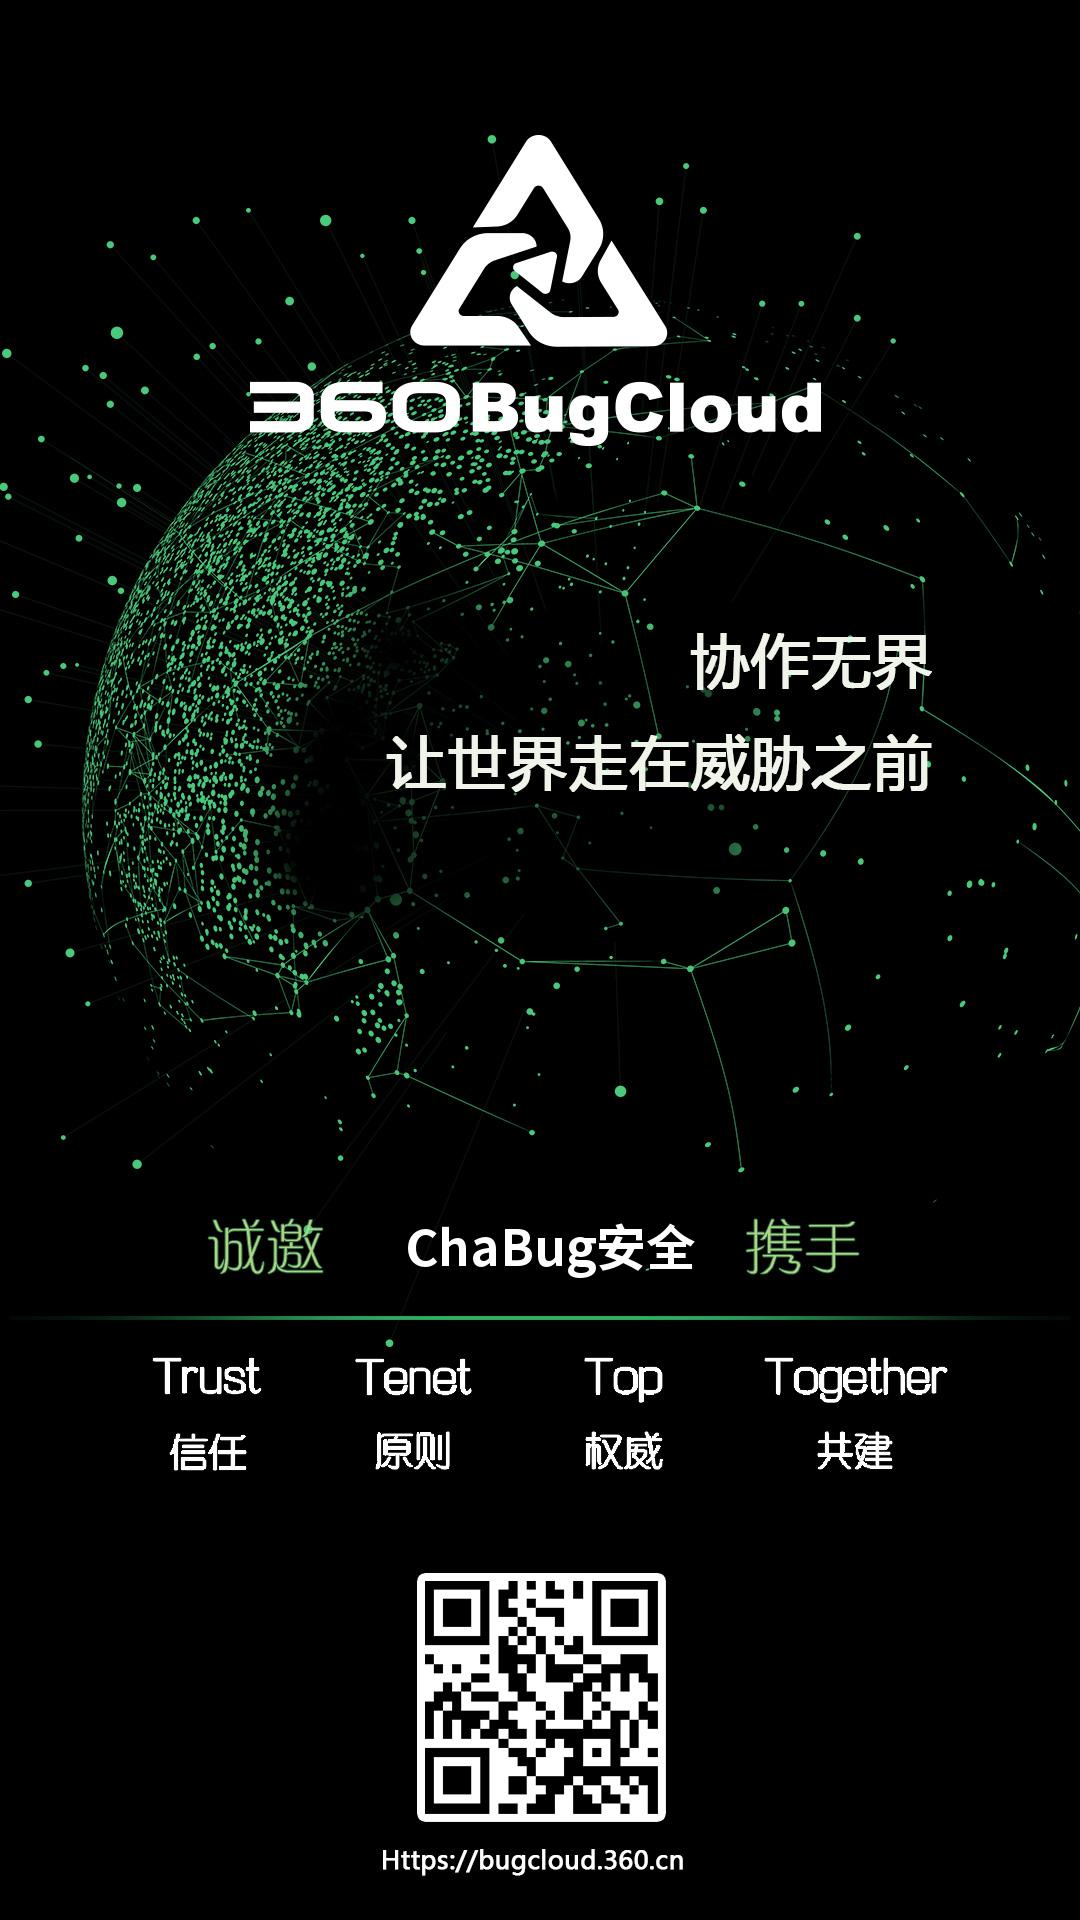 ChaBug安全.jpg